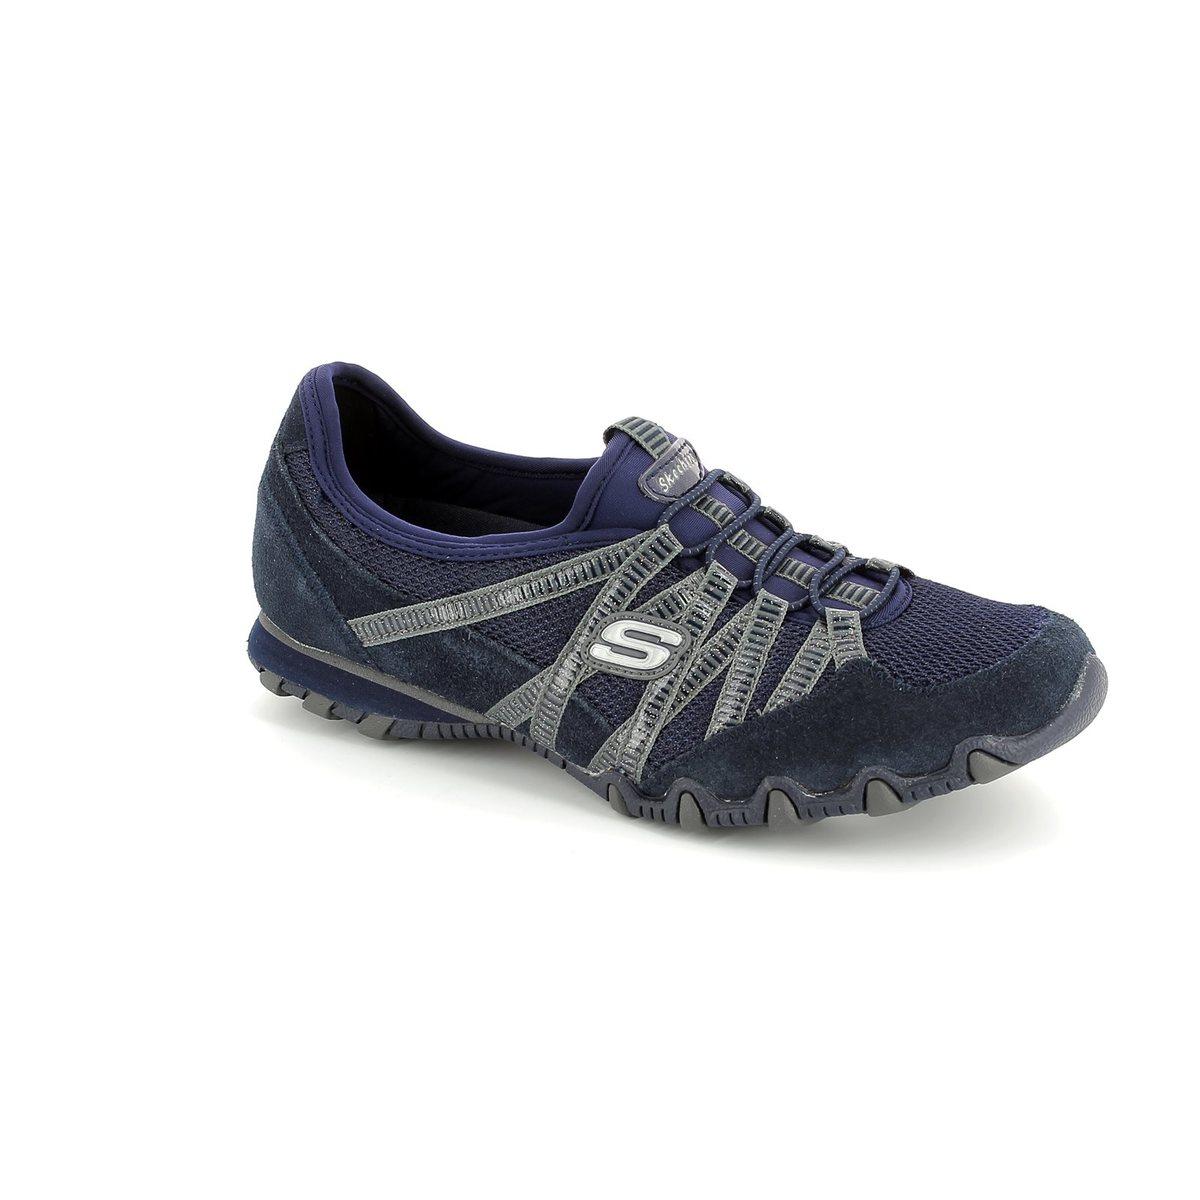 4ad3eab23ba Skechers Lacing Shoes - Navy - 21159 HOT TICKET BIKER